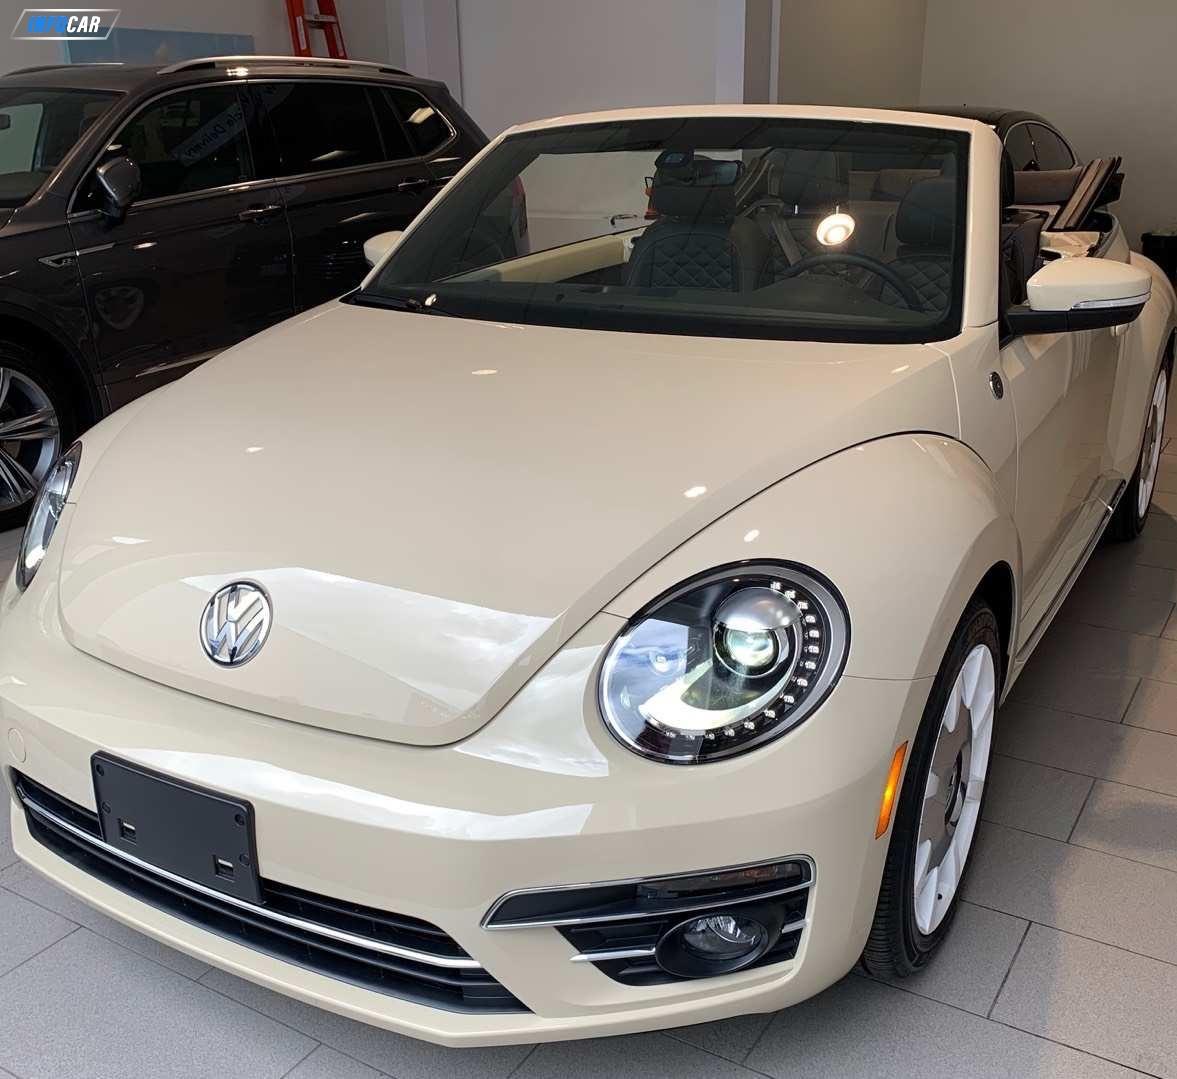 2019 Volkswagen Beetle beetle convertible  - INFOCAR - Toronto's Most Comprehensive New and Used Auto Trading Platform